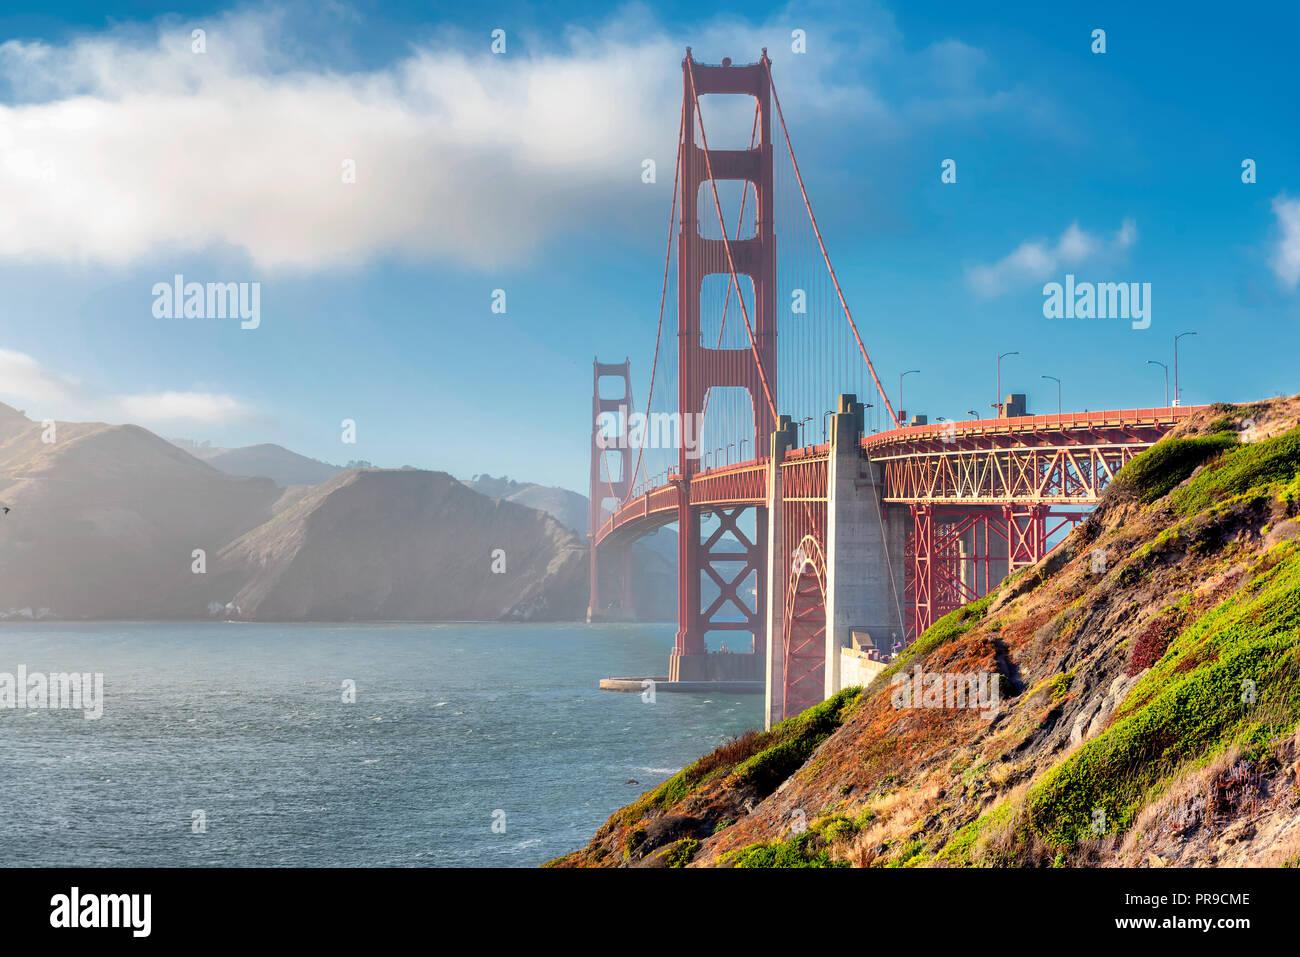 Golden Gate Bridge at sunset, San Francisco - Stock Image